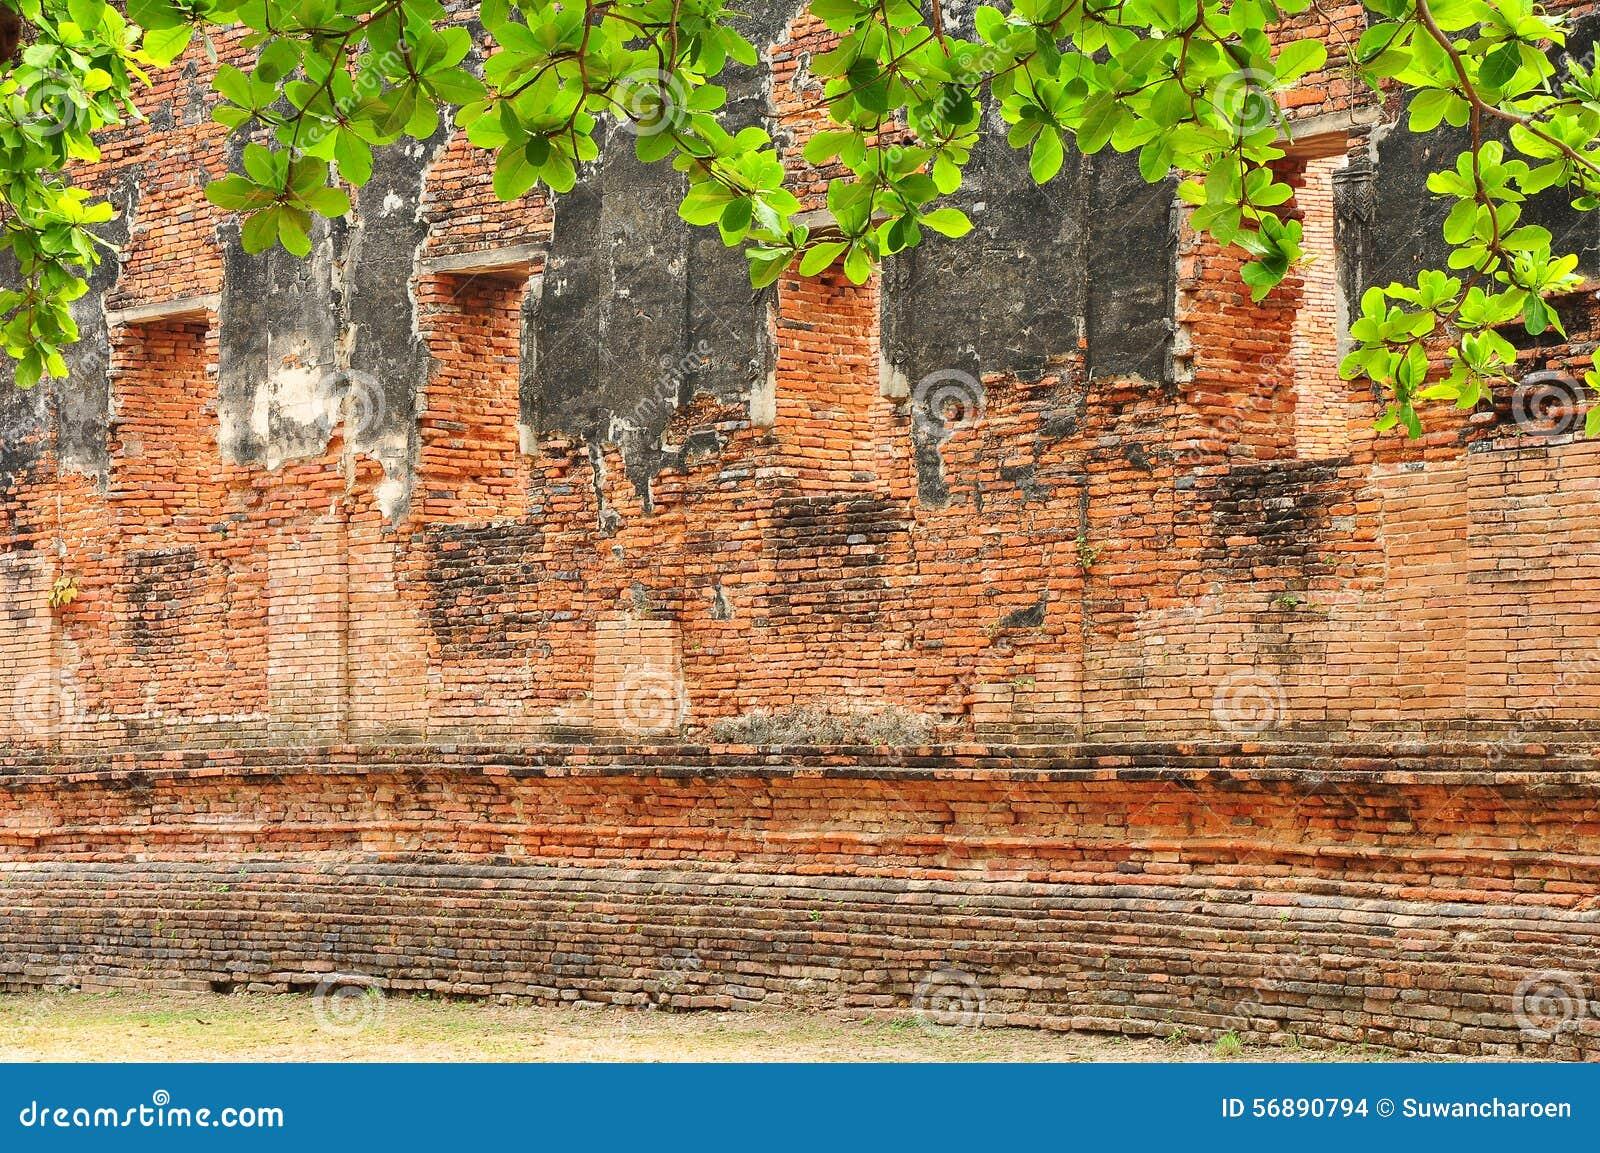 Buddism antico rimane